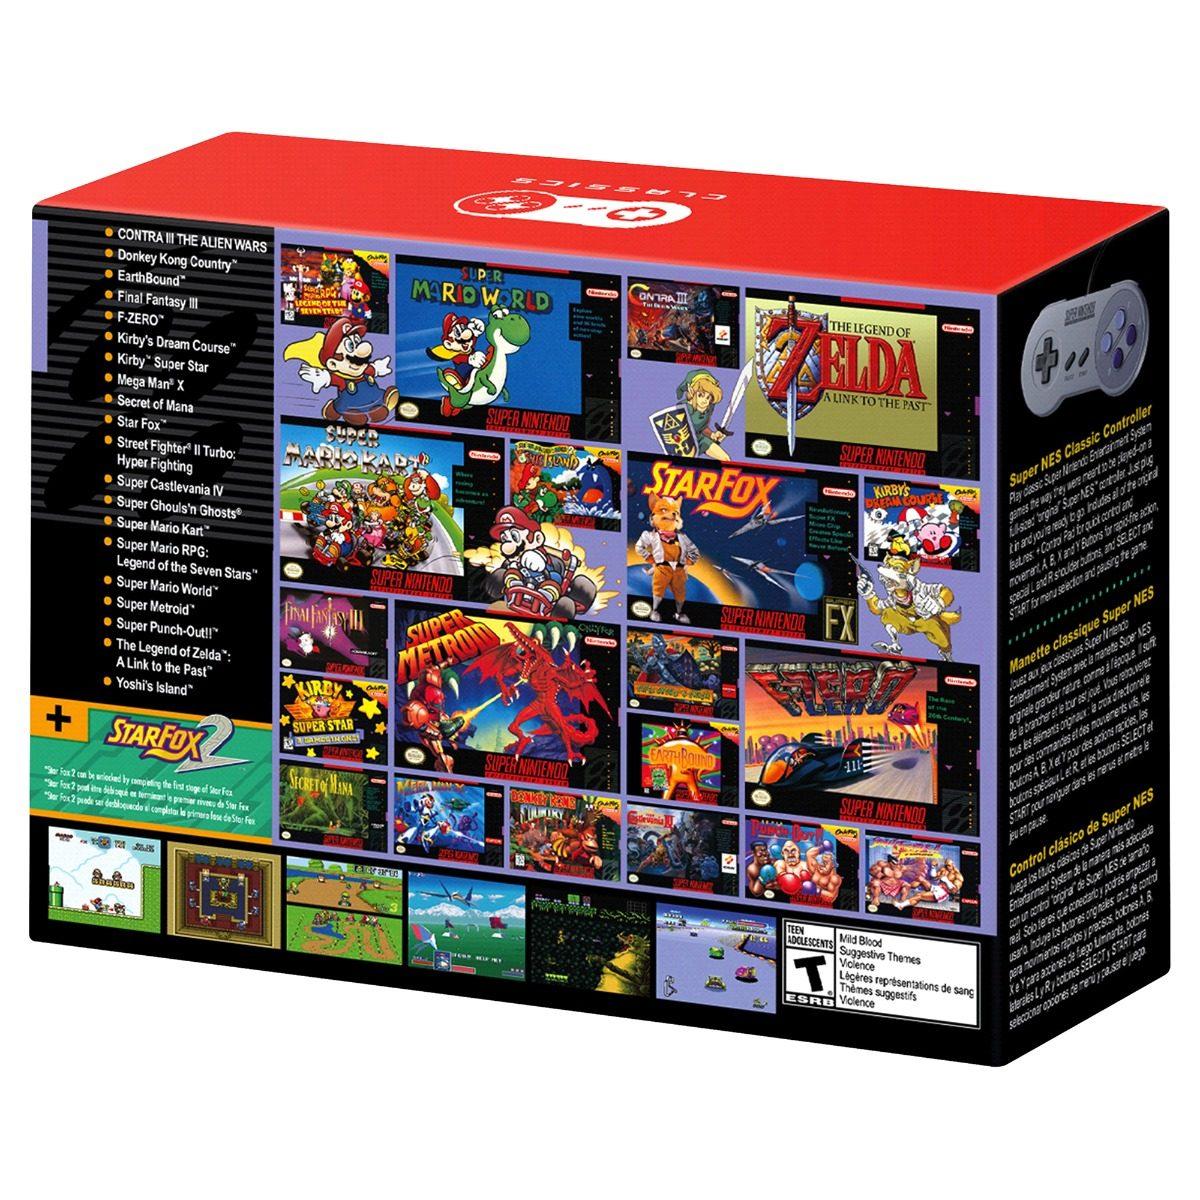 Consola Super Nintendo Snes Classic 2 999 00 En Mercado Libre